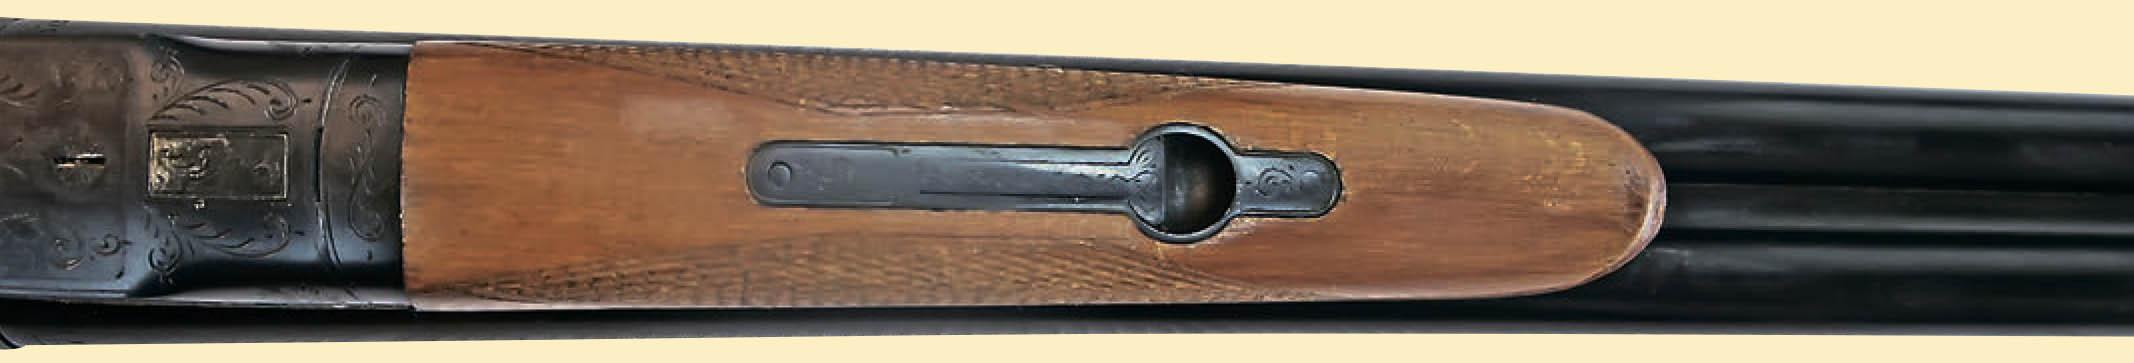 Ствольная коробка ТОЗ-25. Вид снизу